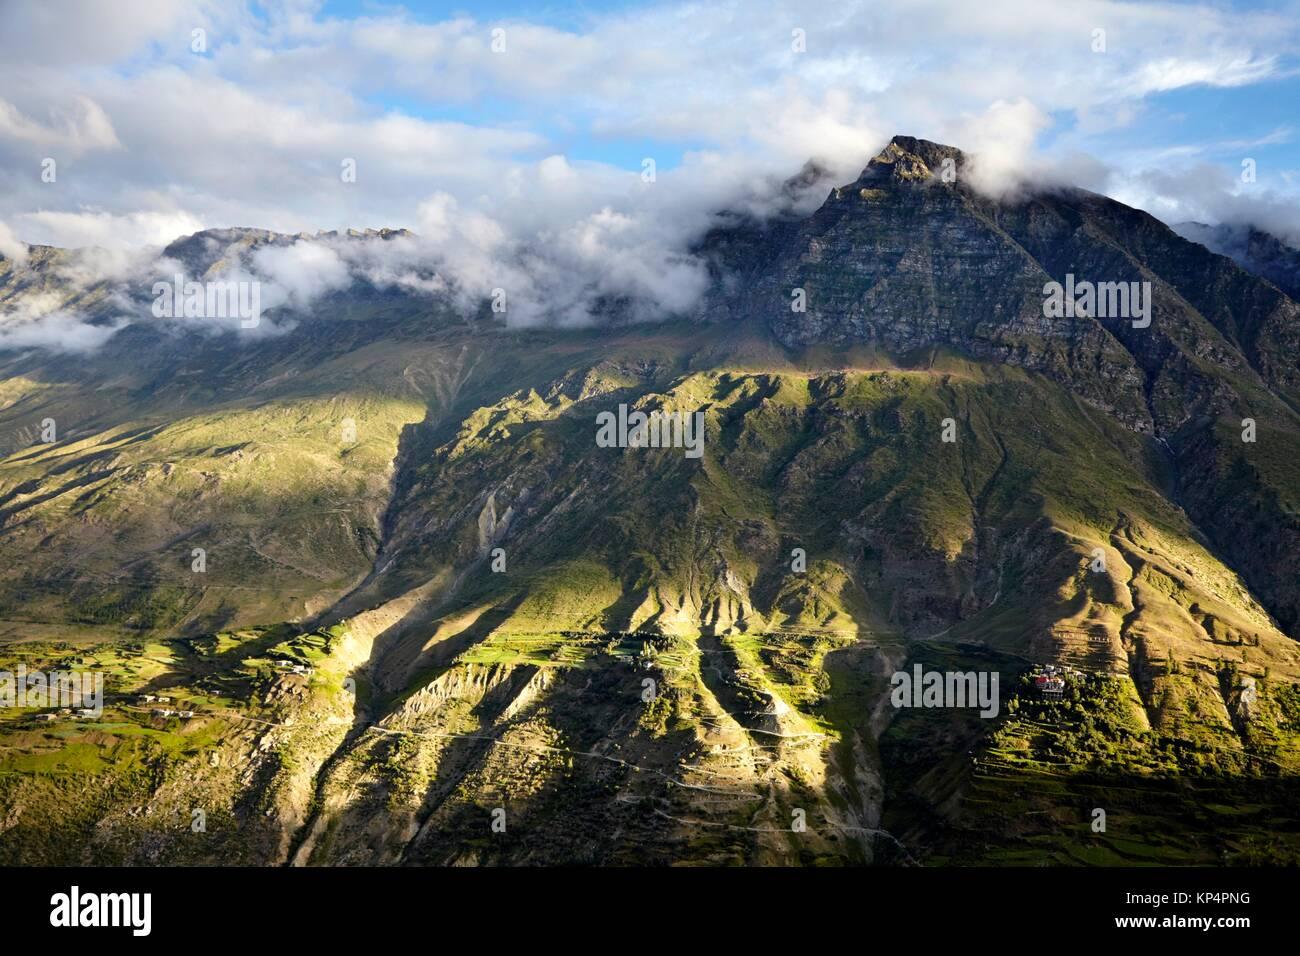 View from Shashur Gompa, Lahaul Valley, Keylong, Himachal Pradesh, India. - Stock Image